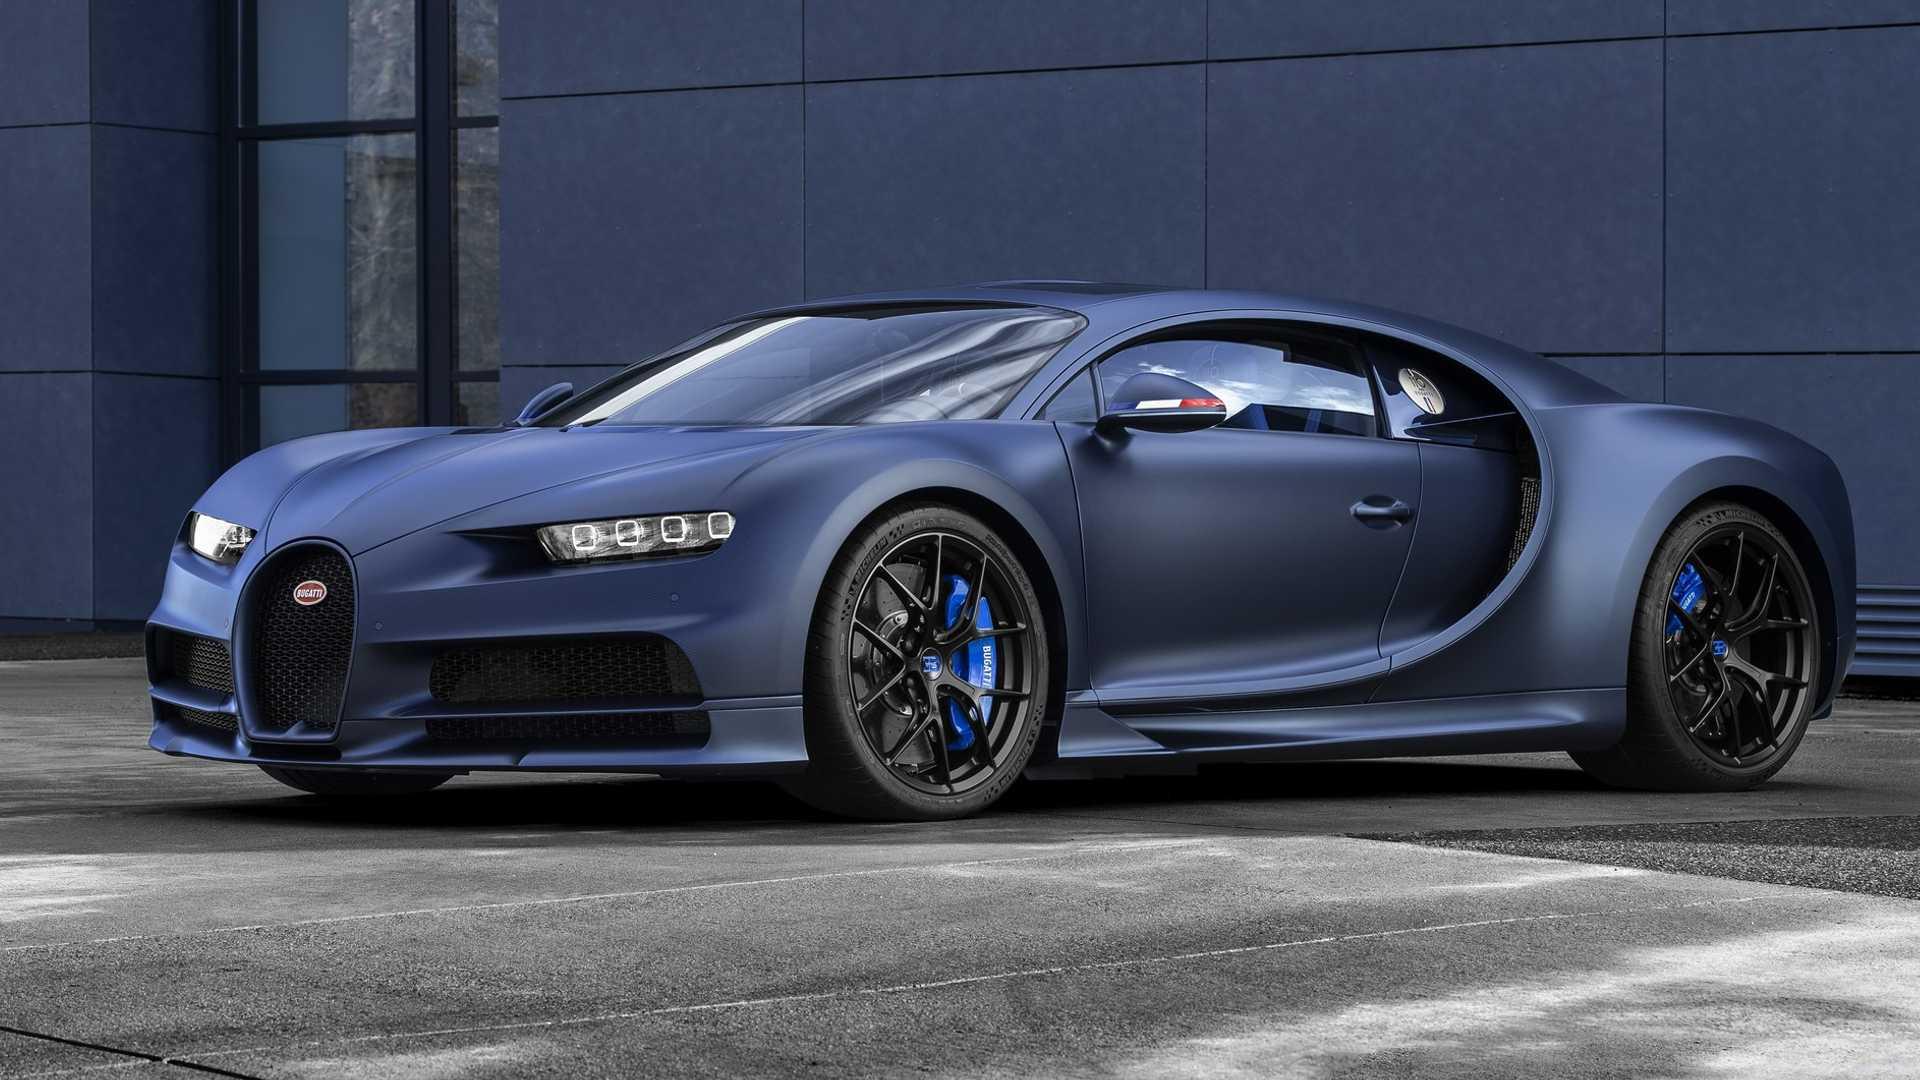 bugatti-chiron-sport-110-ans-bugatti (1)